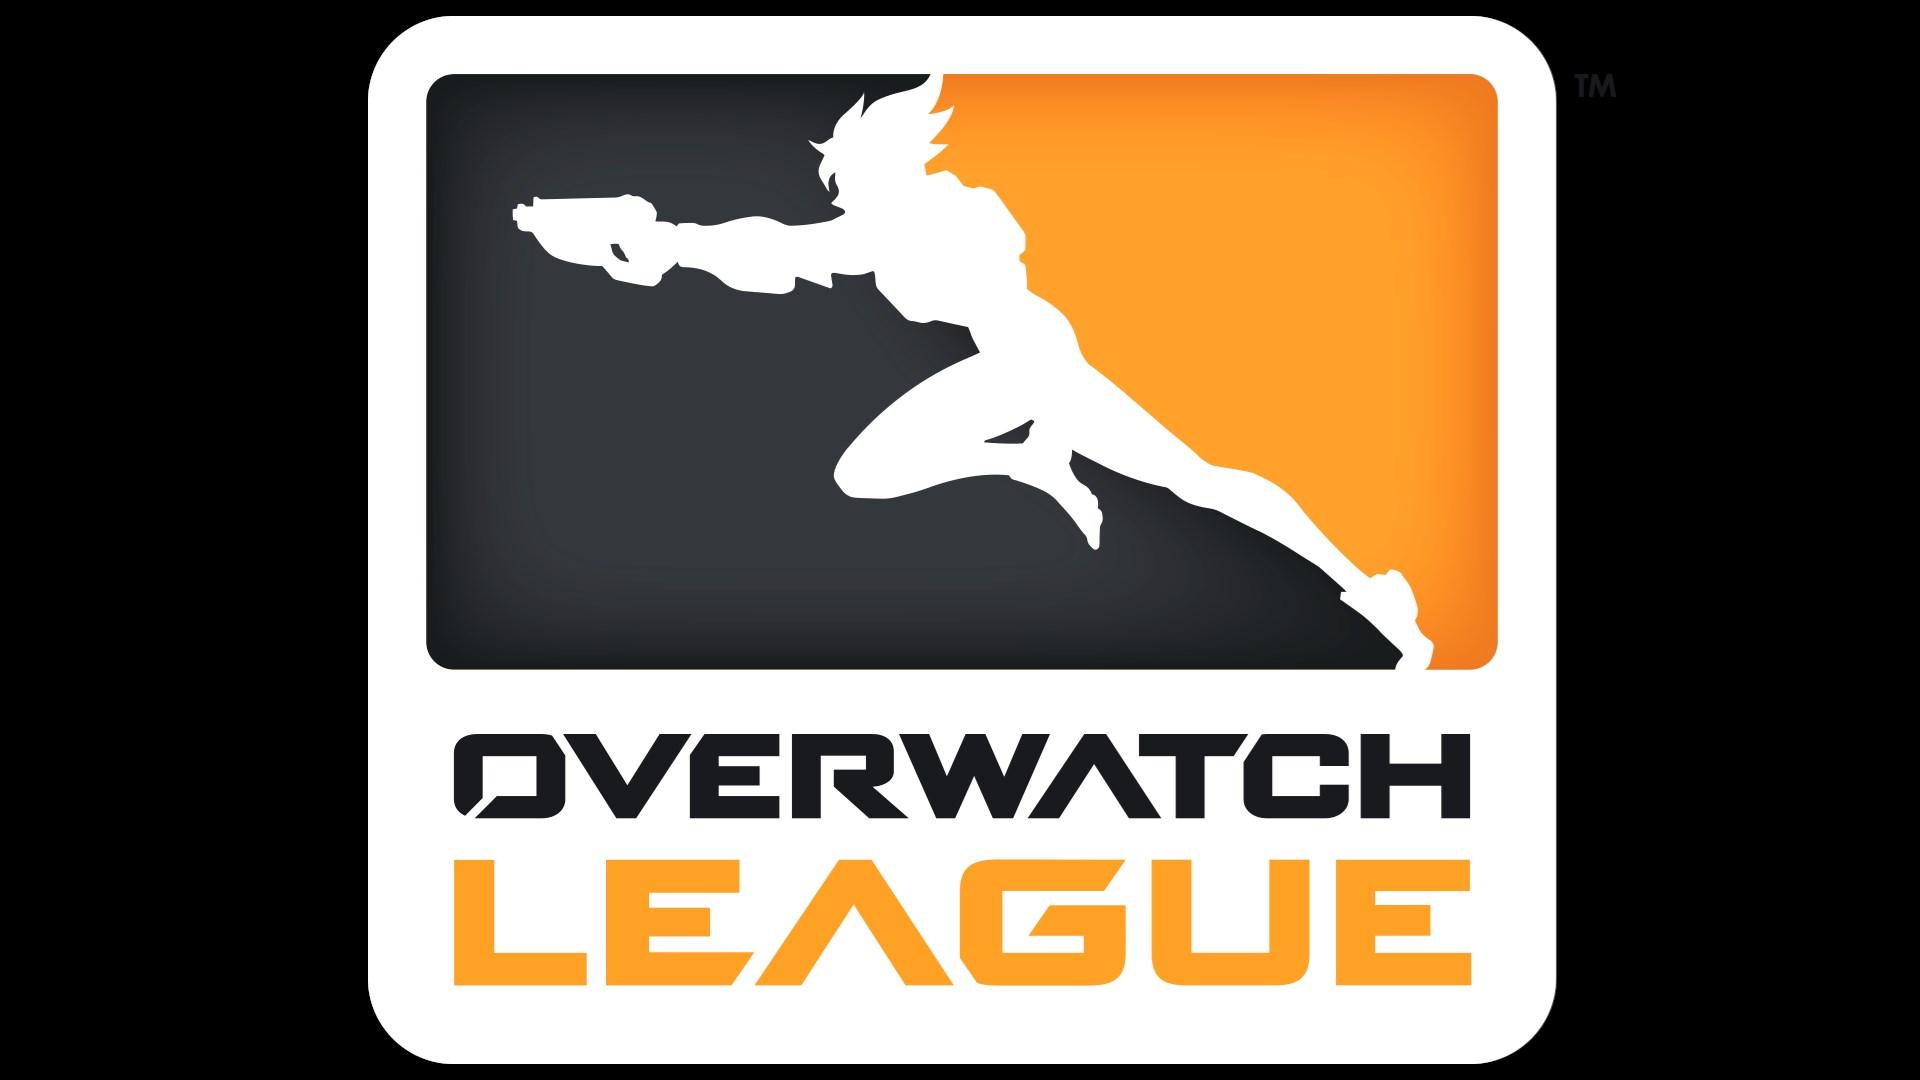 overwatch league1